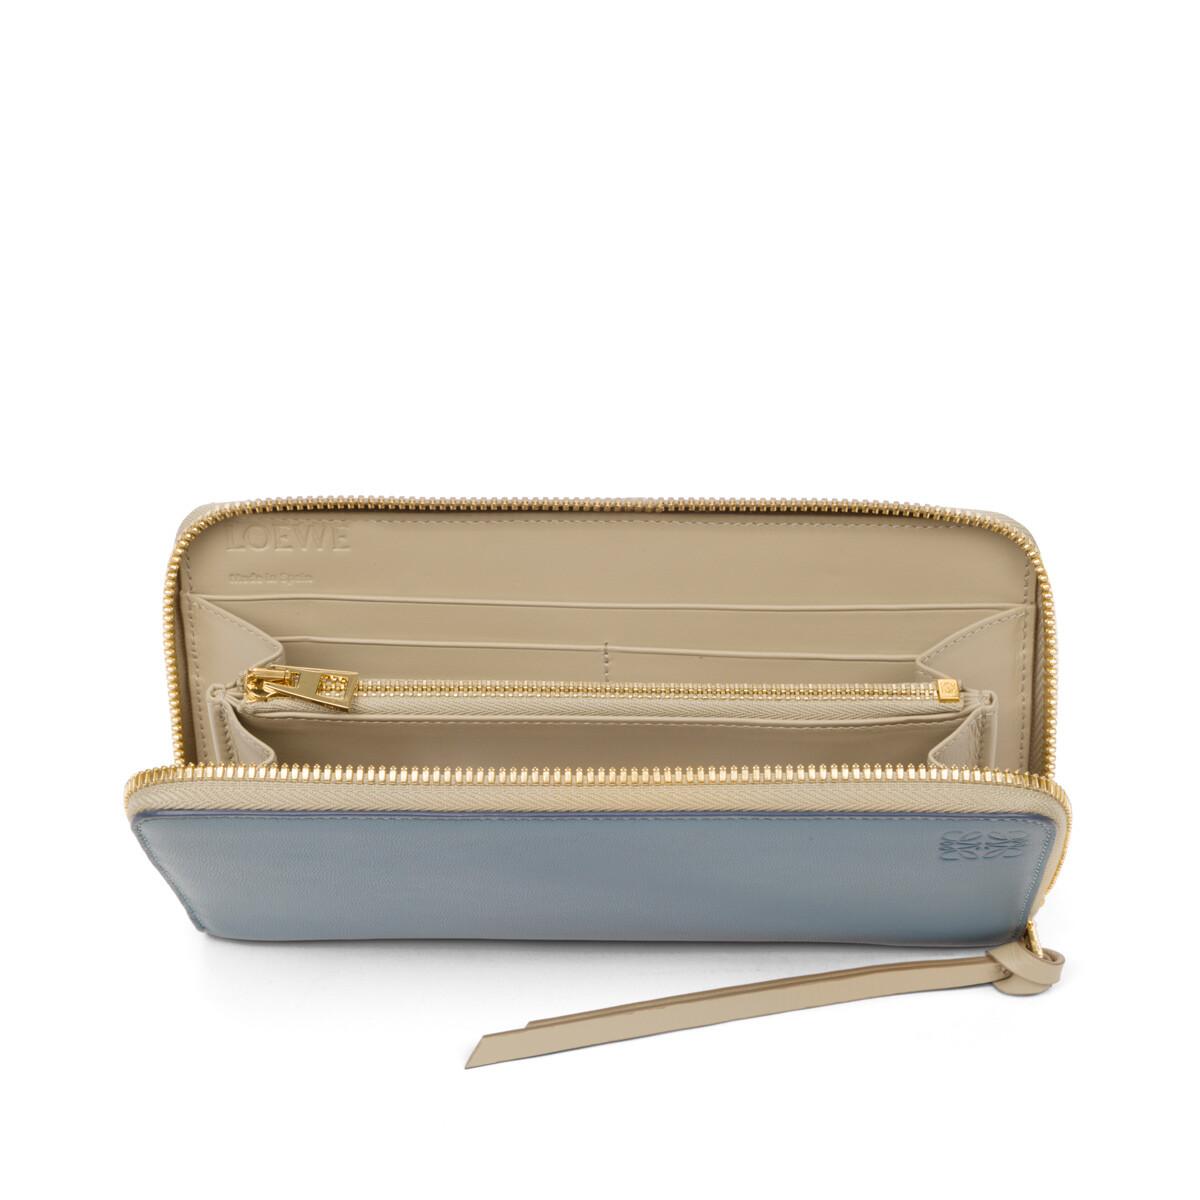 LOEWE Zip Around Wallet Stone Blue/Ivory front